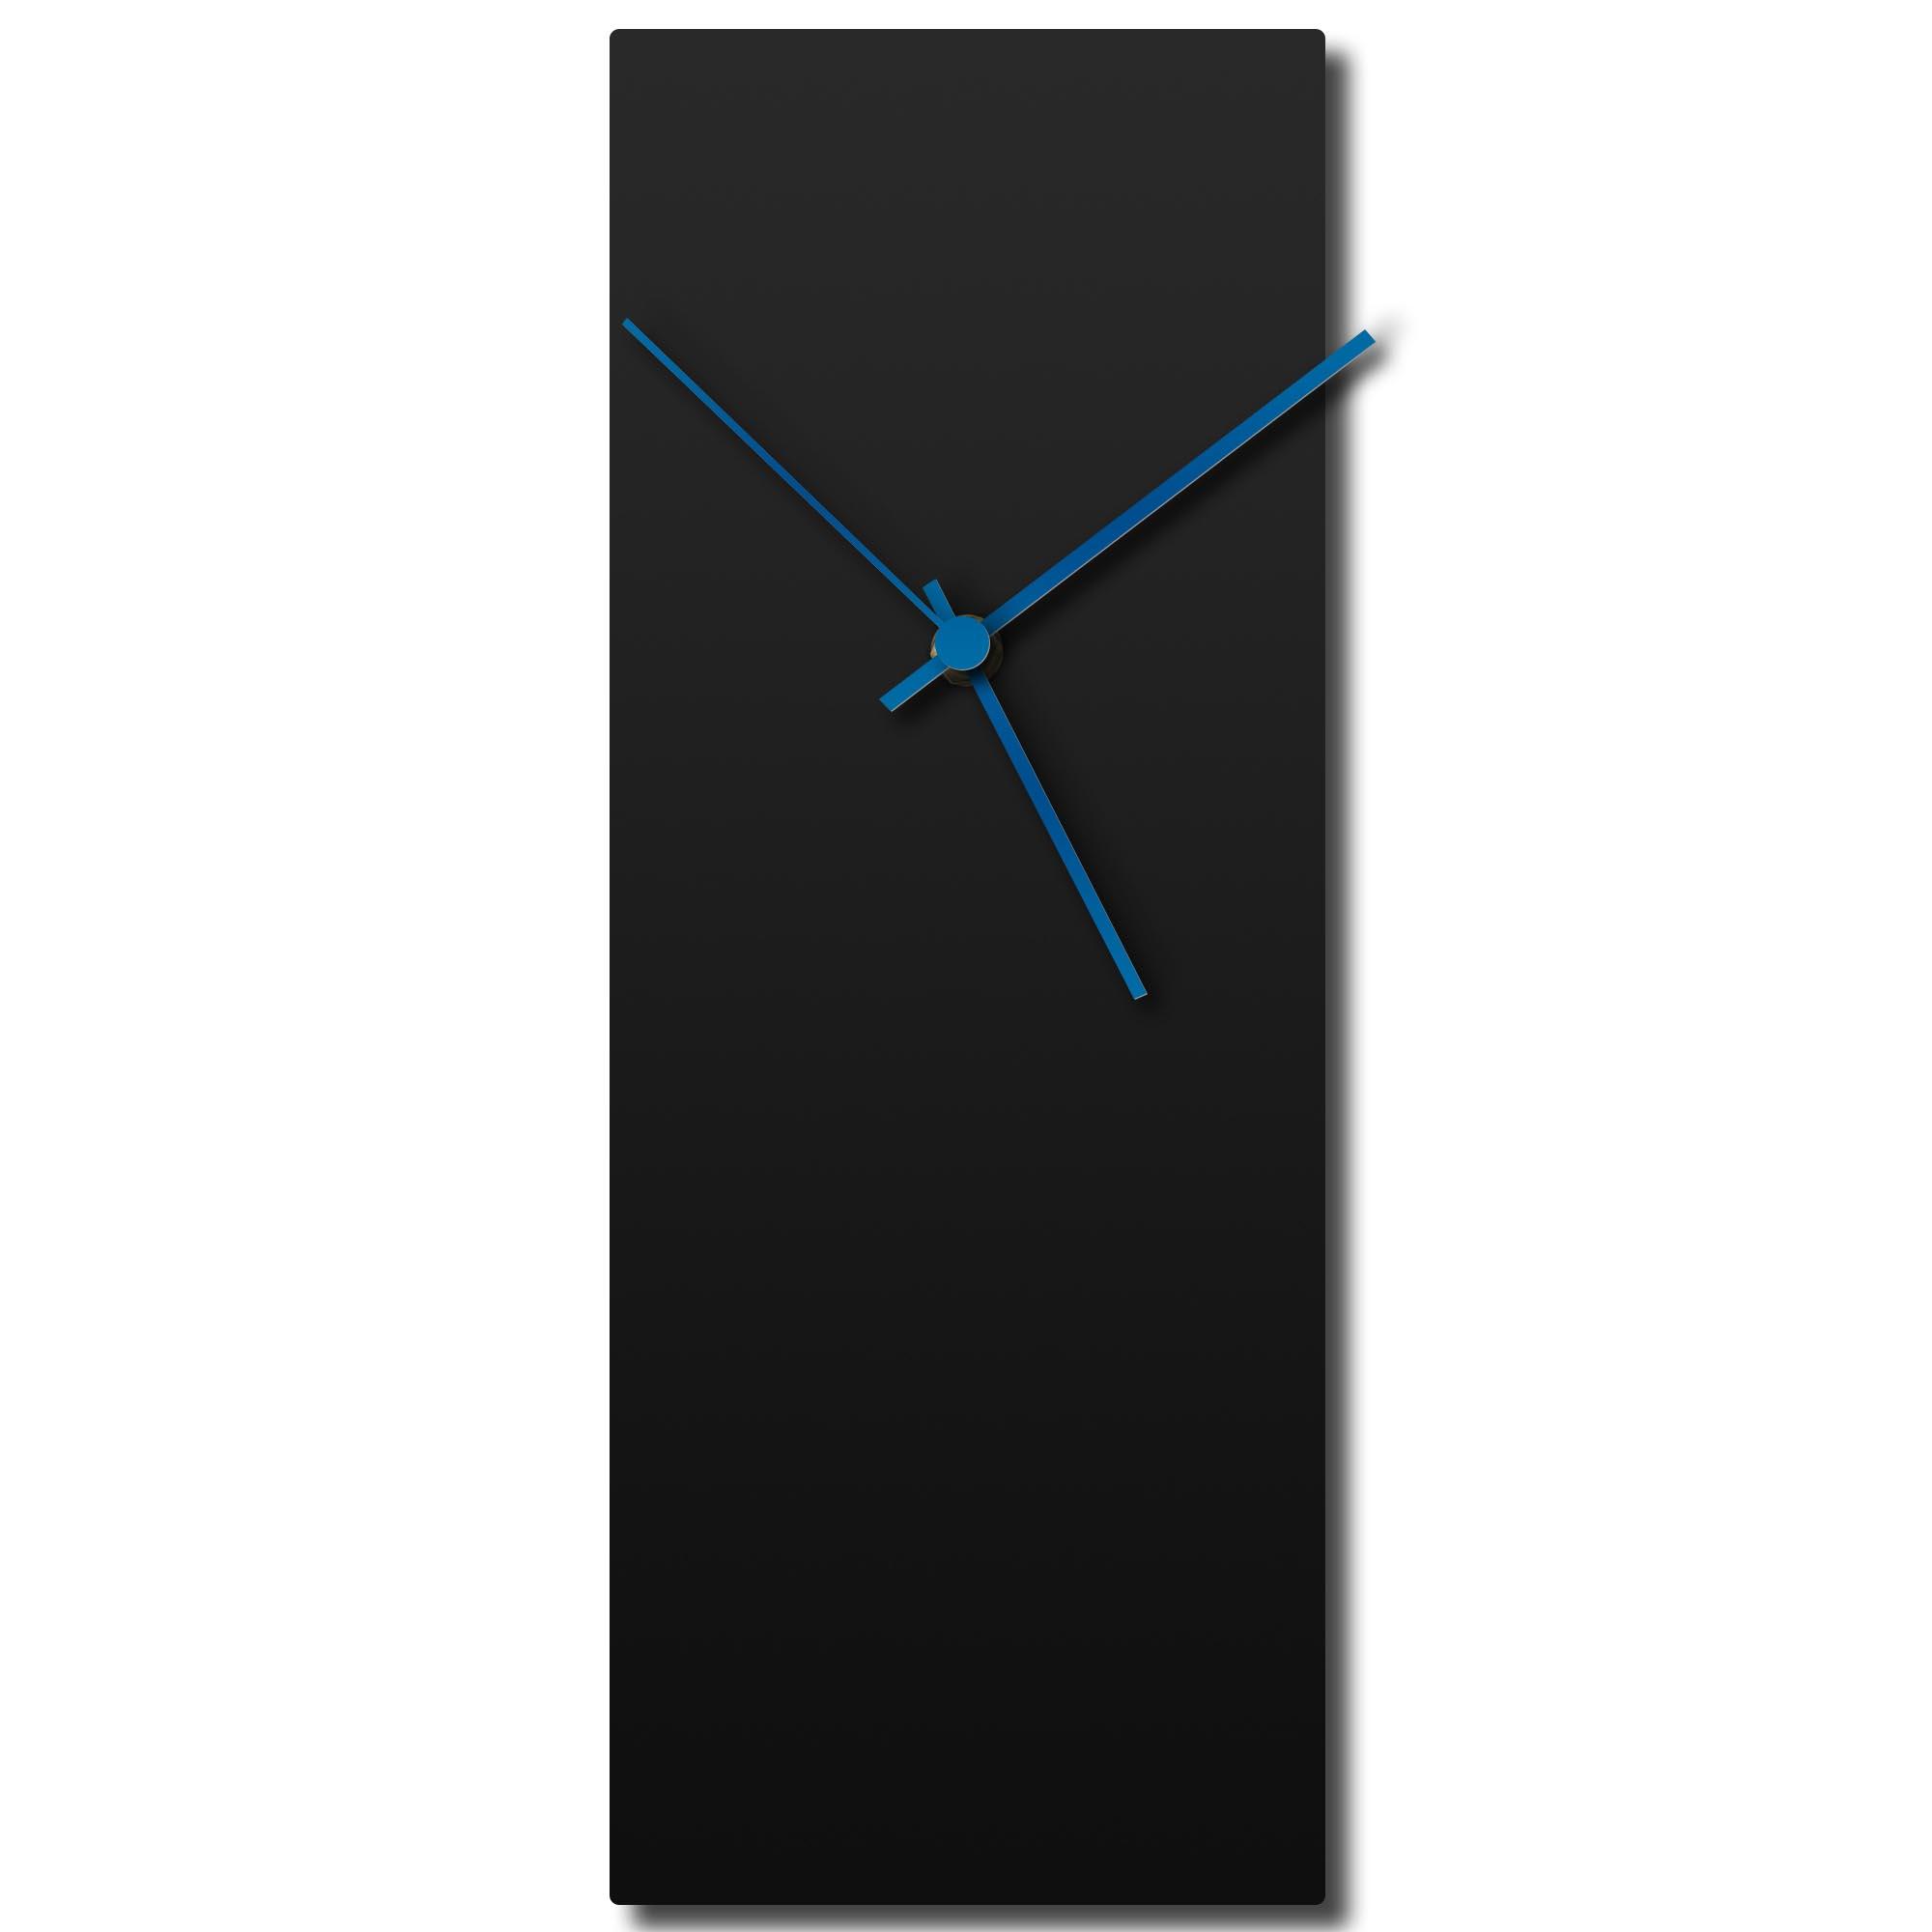 Blackout Blue Clock 8.25x22in. Aluminum Polymetal